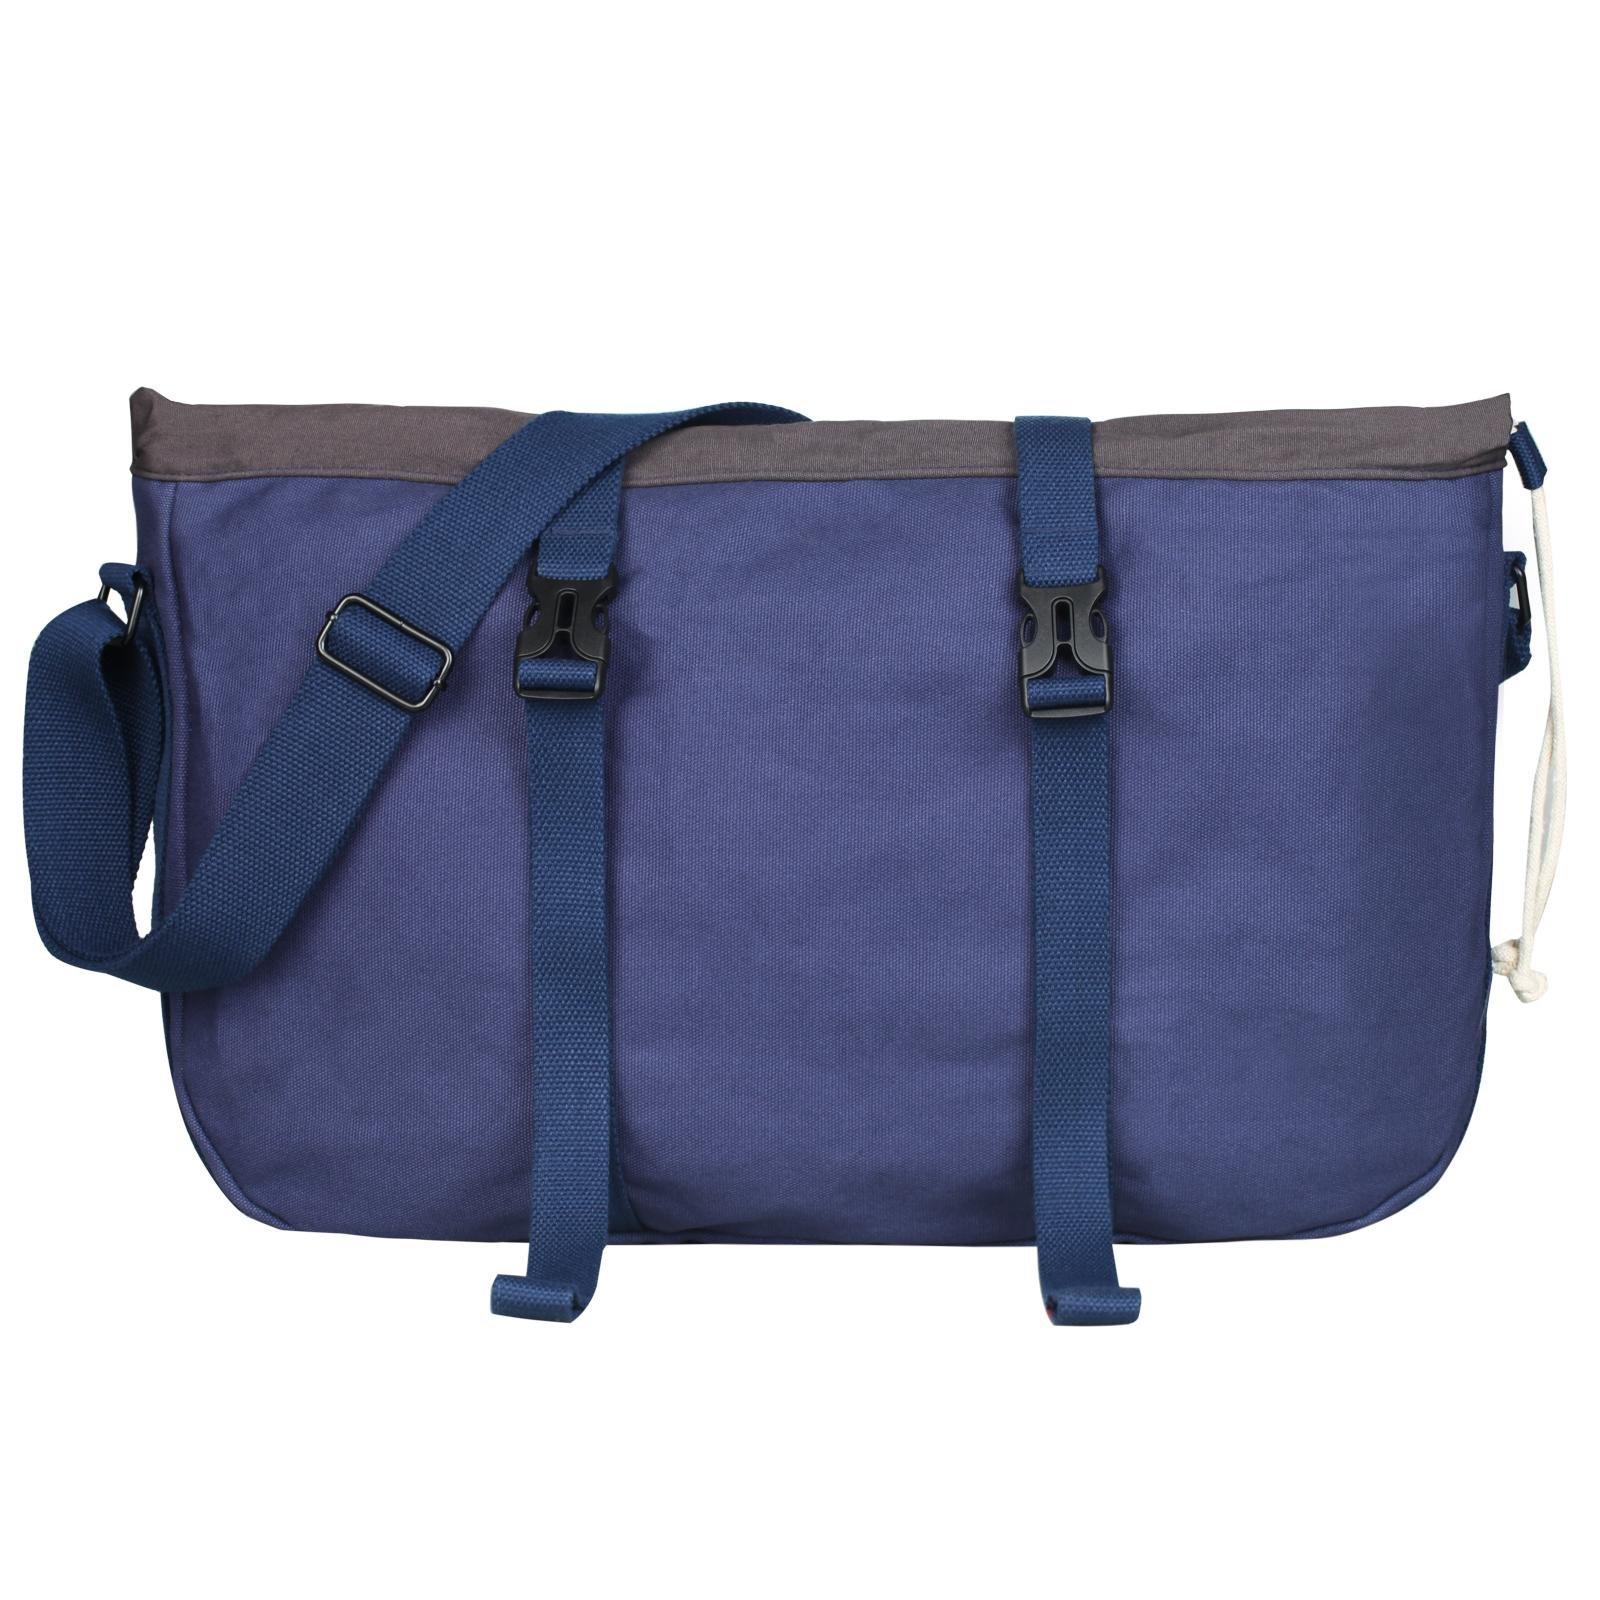 ParaPace 17 inch Laptop Canvas Messenger Bag,Casual Vintage Shoulder Bag, Cross Body Bag Travel Bag for Men Women